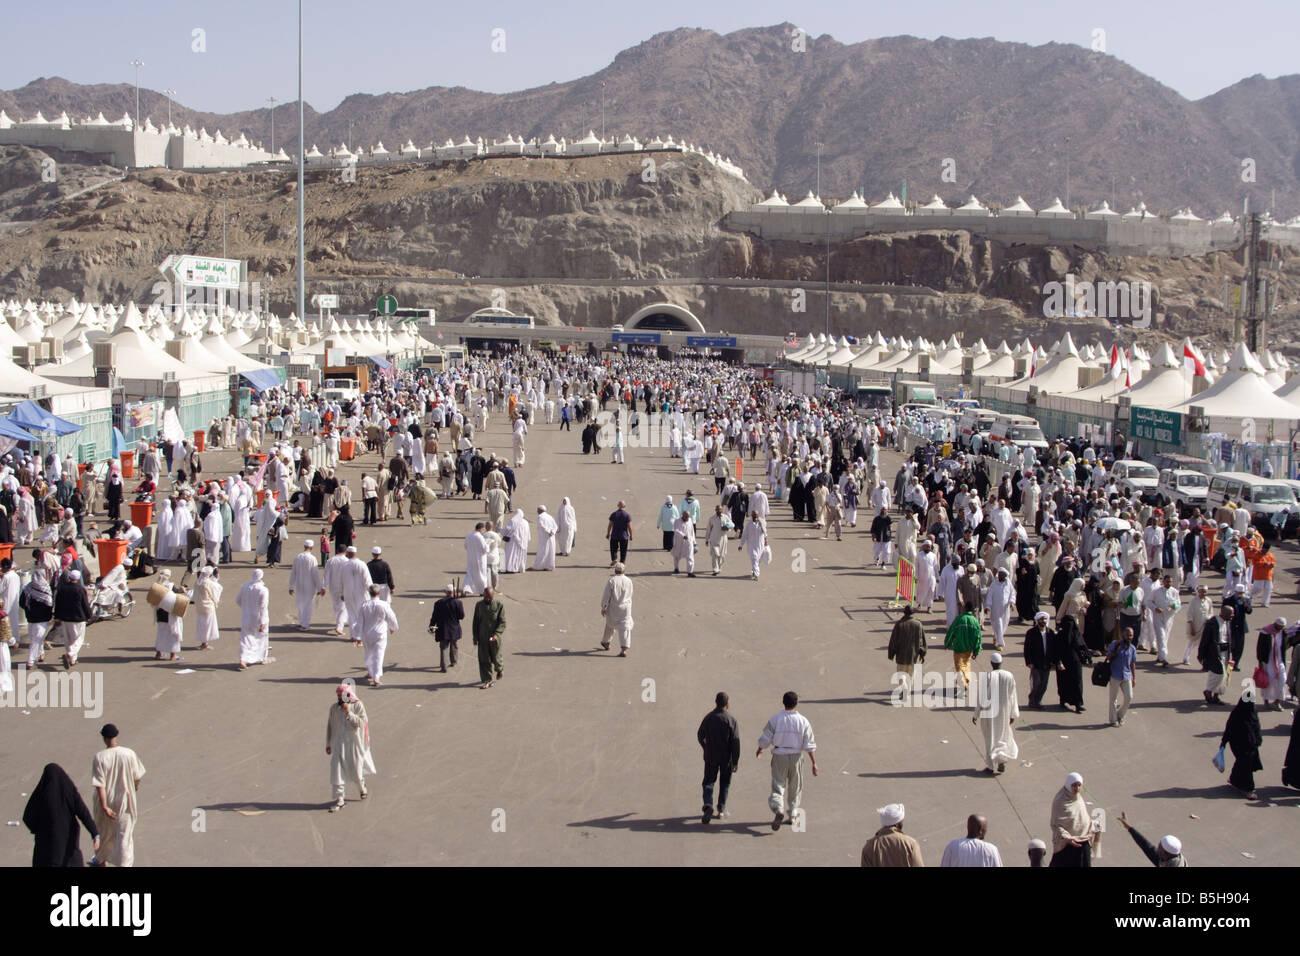 Pilgrims in Mina during the hajj Stock Photo, Royalty Free ...